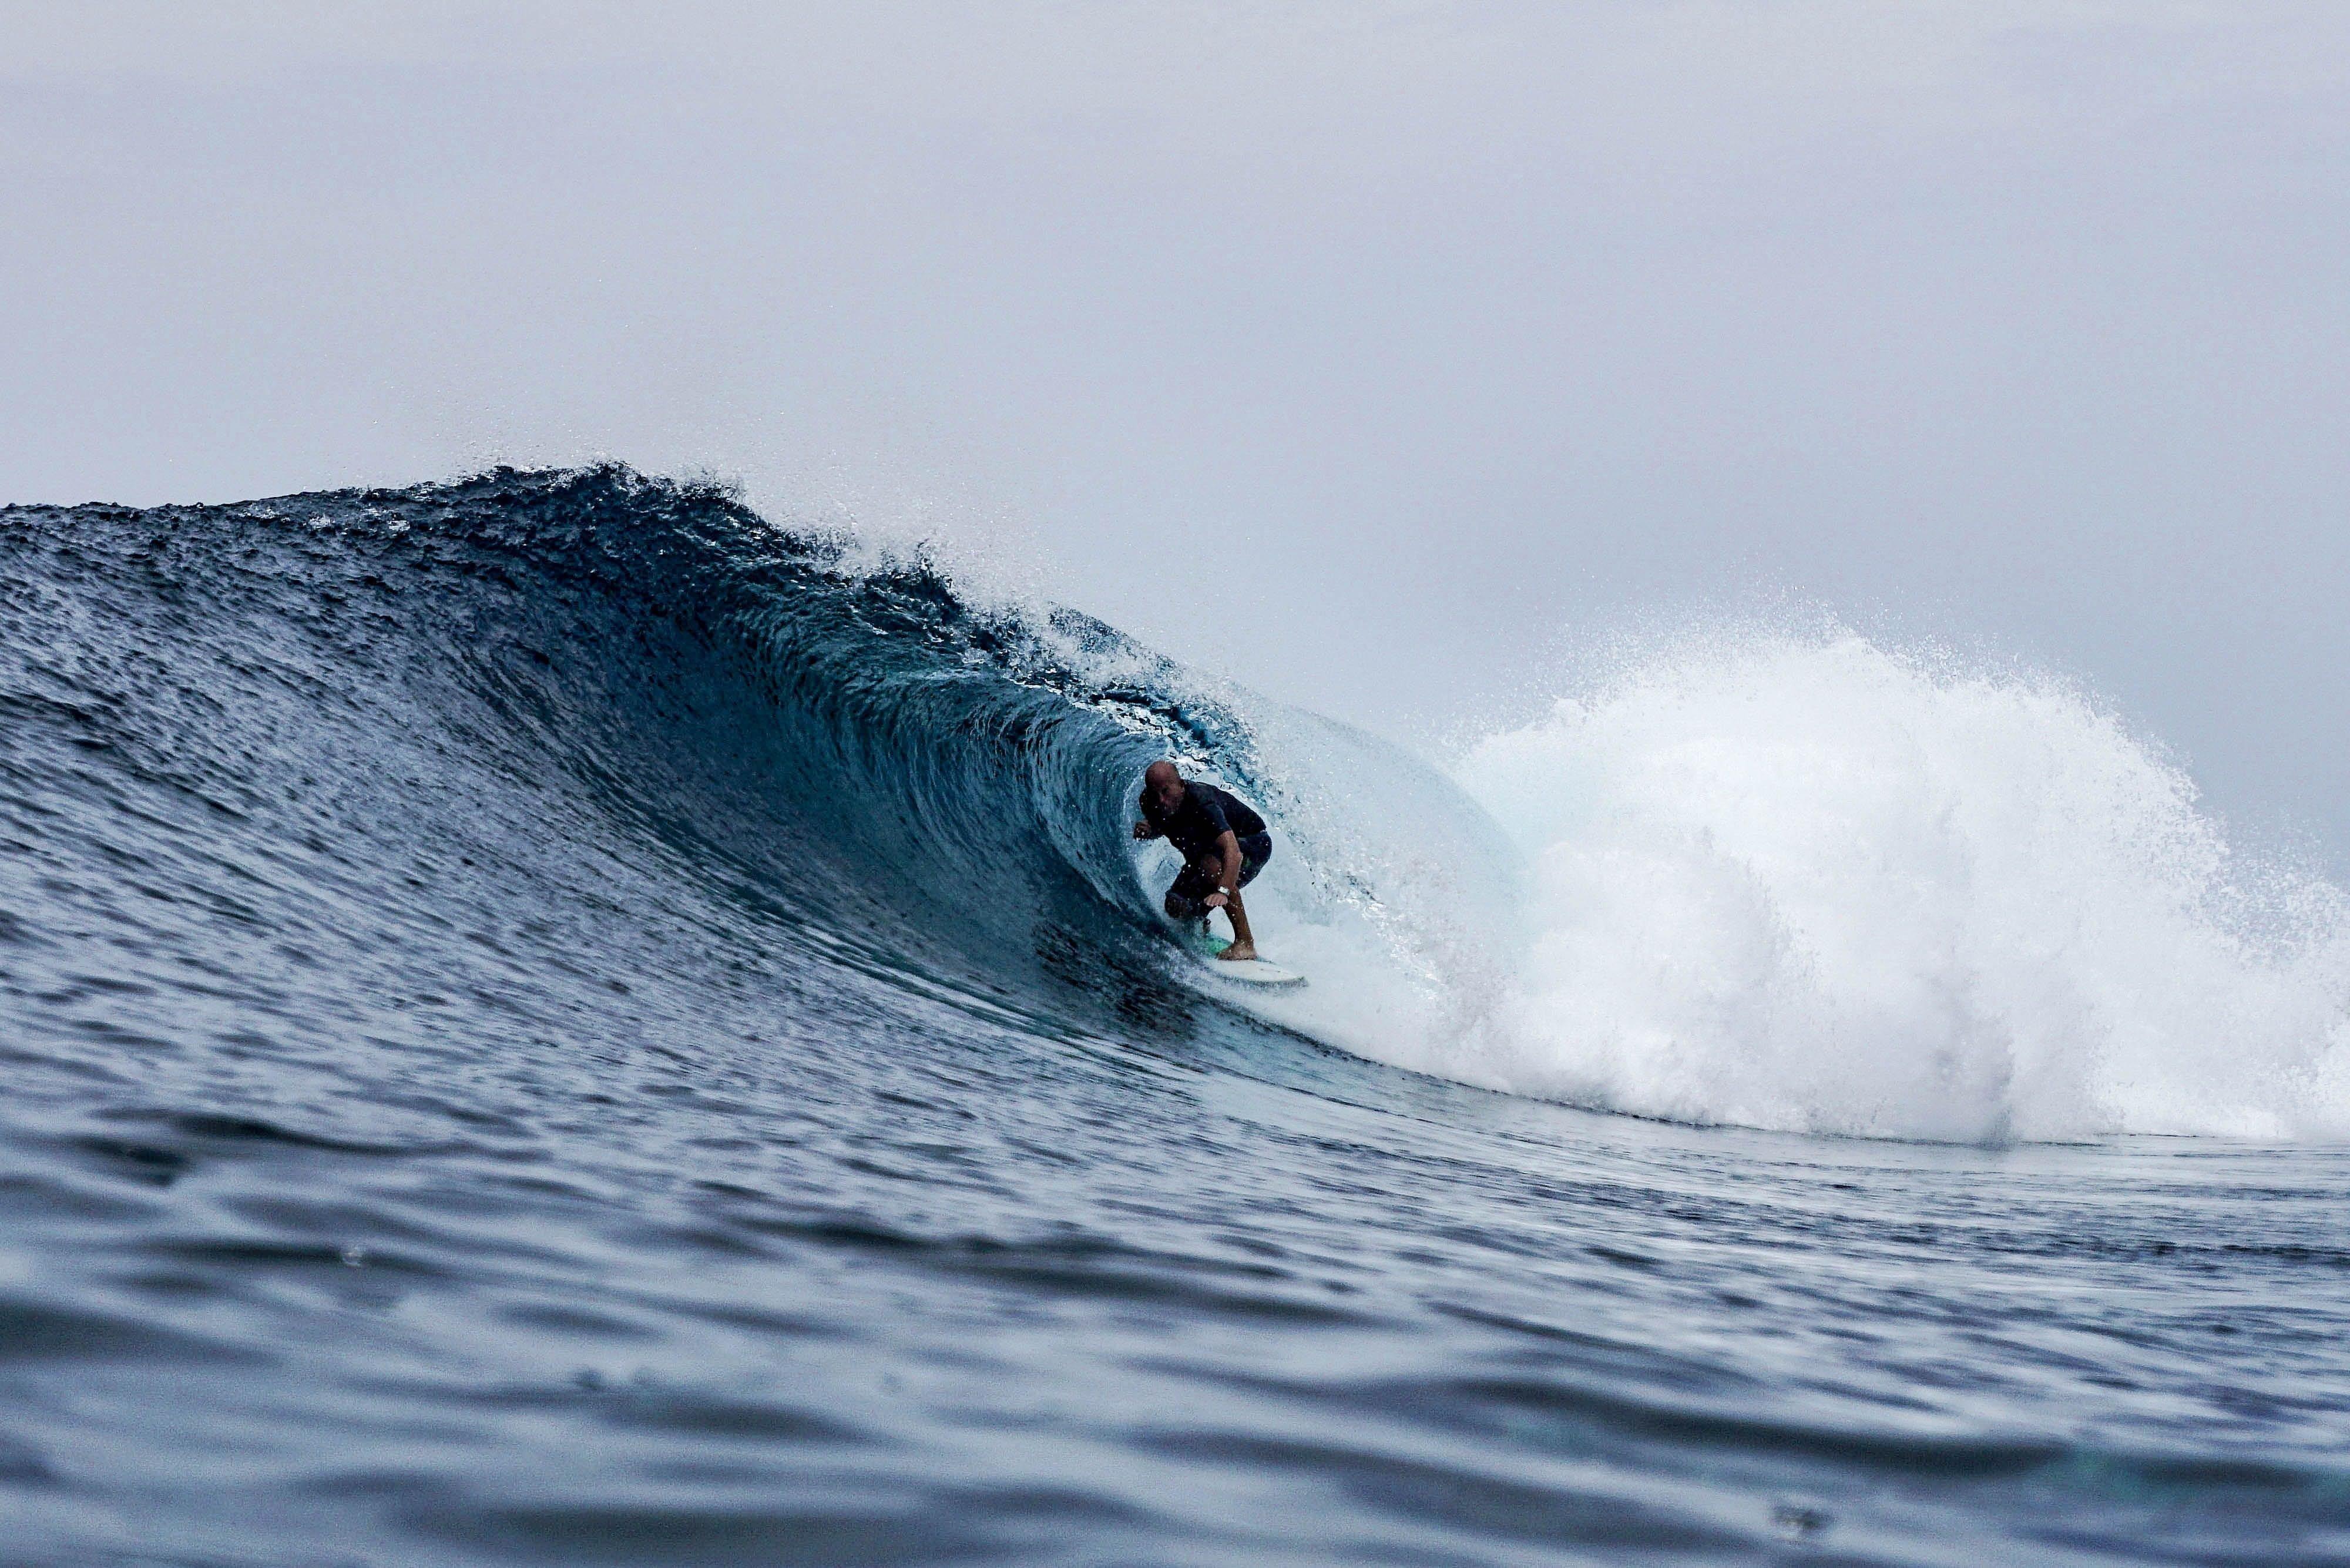 Simeulue Island Surfspot: Dylan's righthander reefbreak